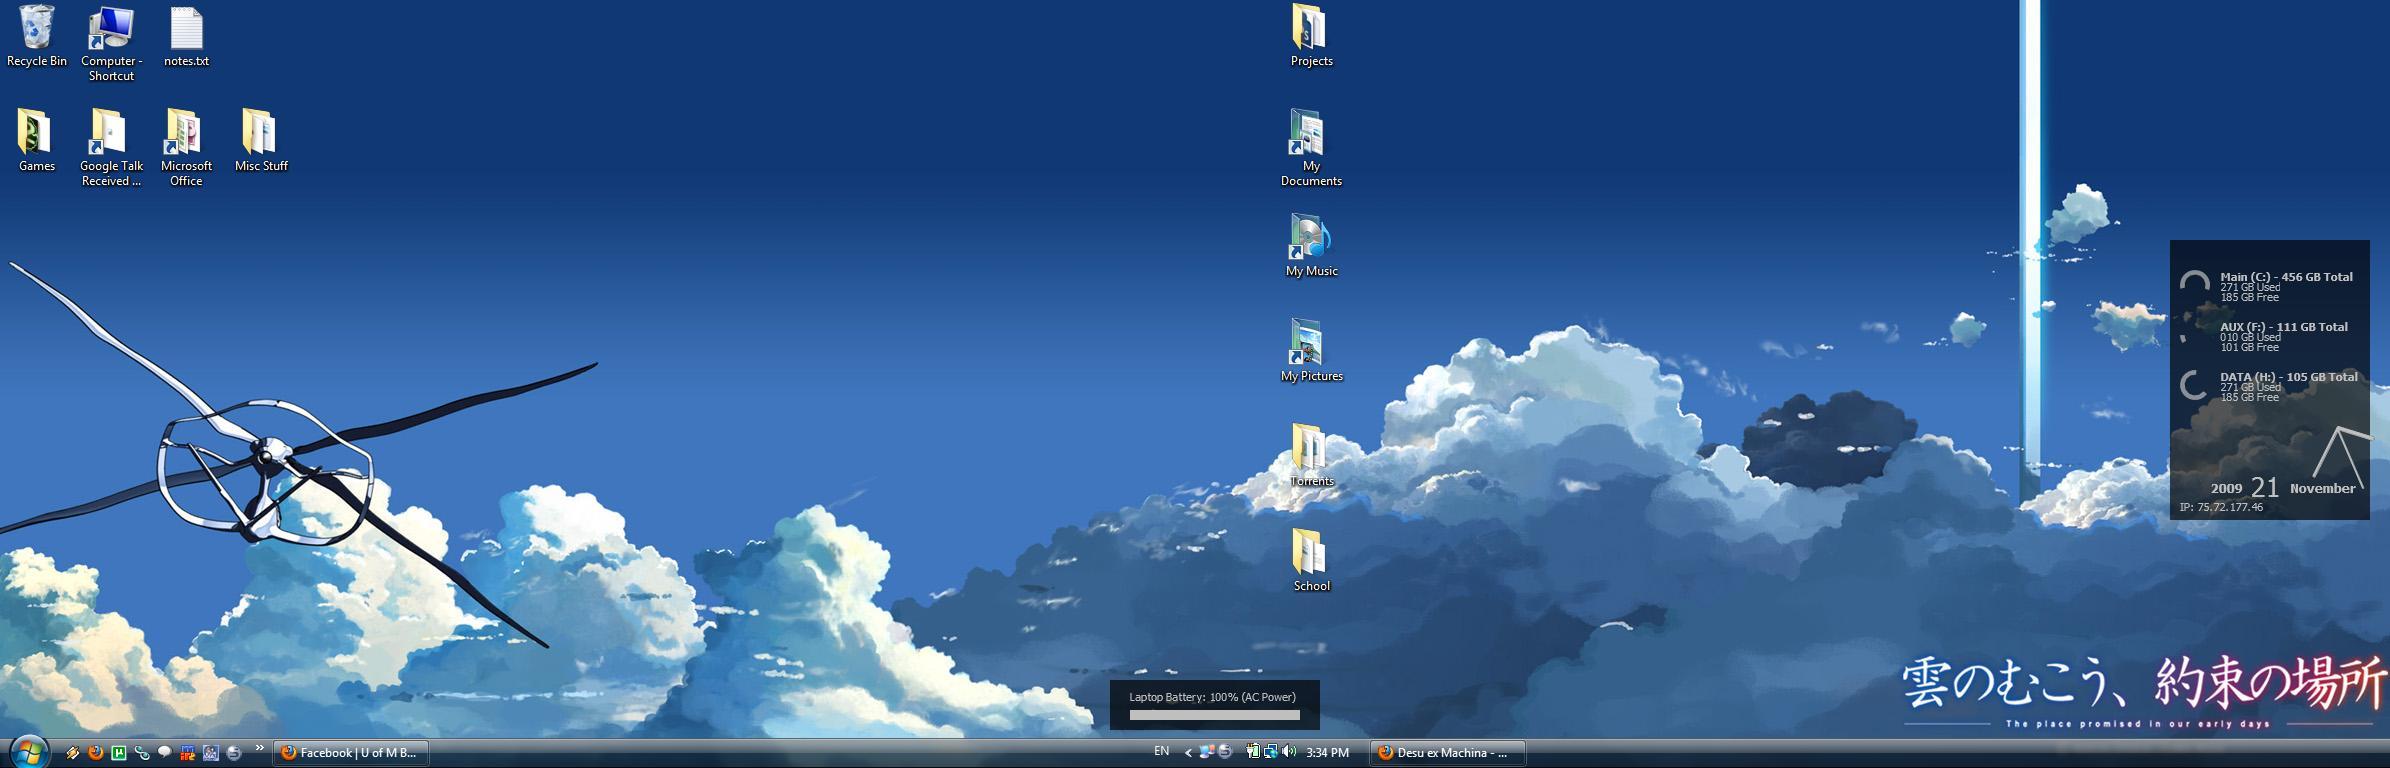 wallpaperskd com wallpaper windows wallpaper filesize 3200x1200 689k 2390x768